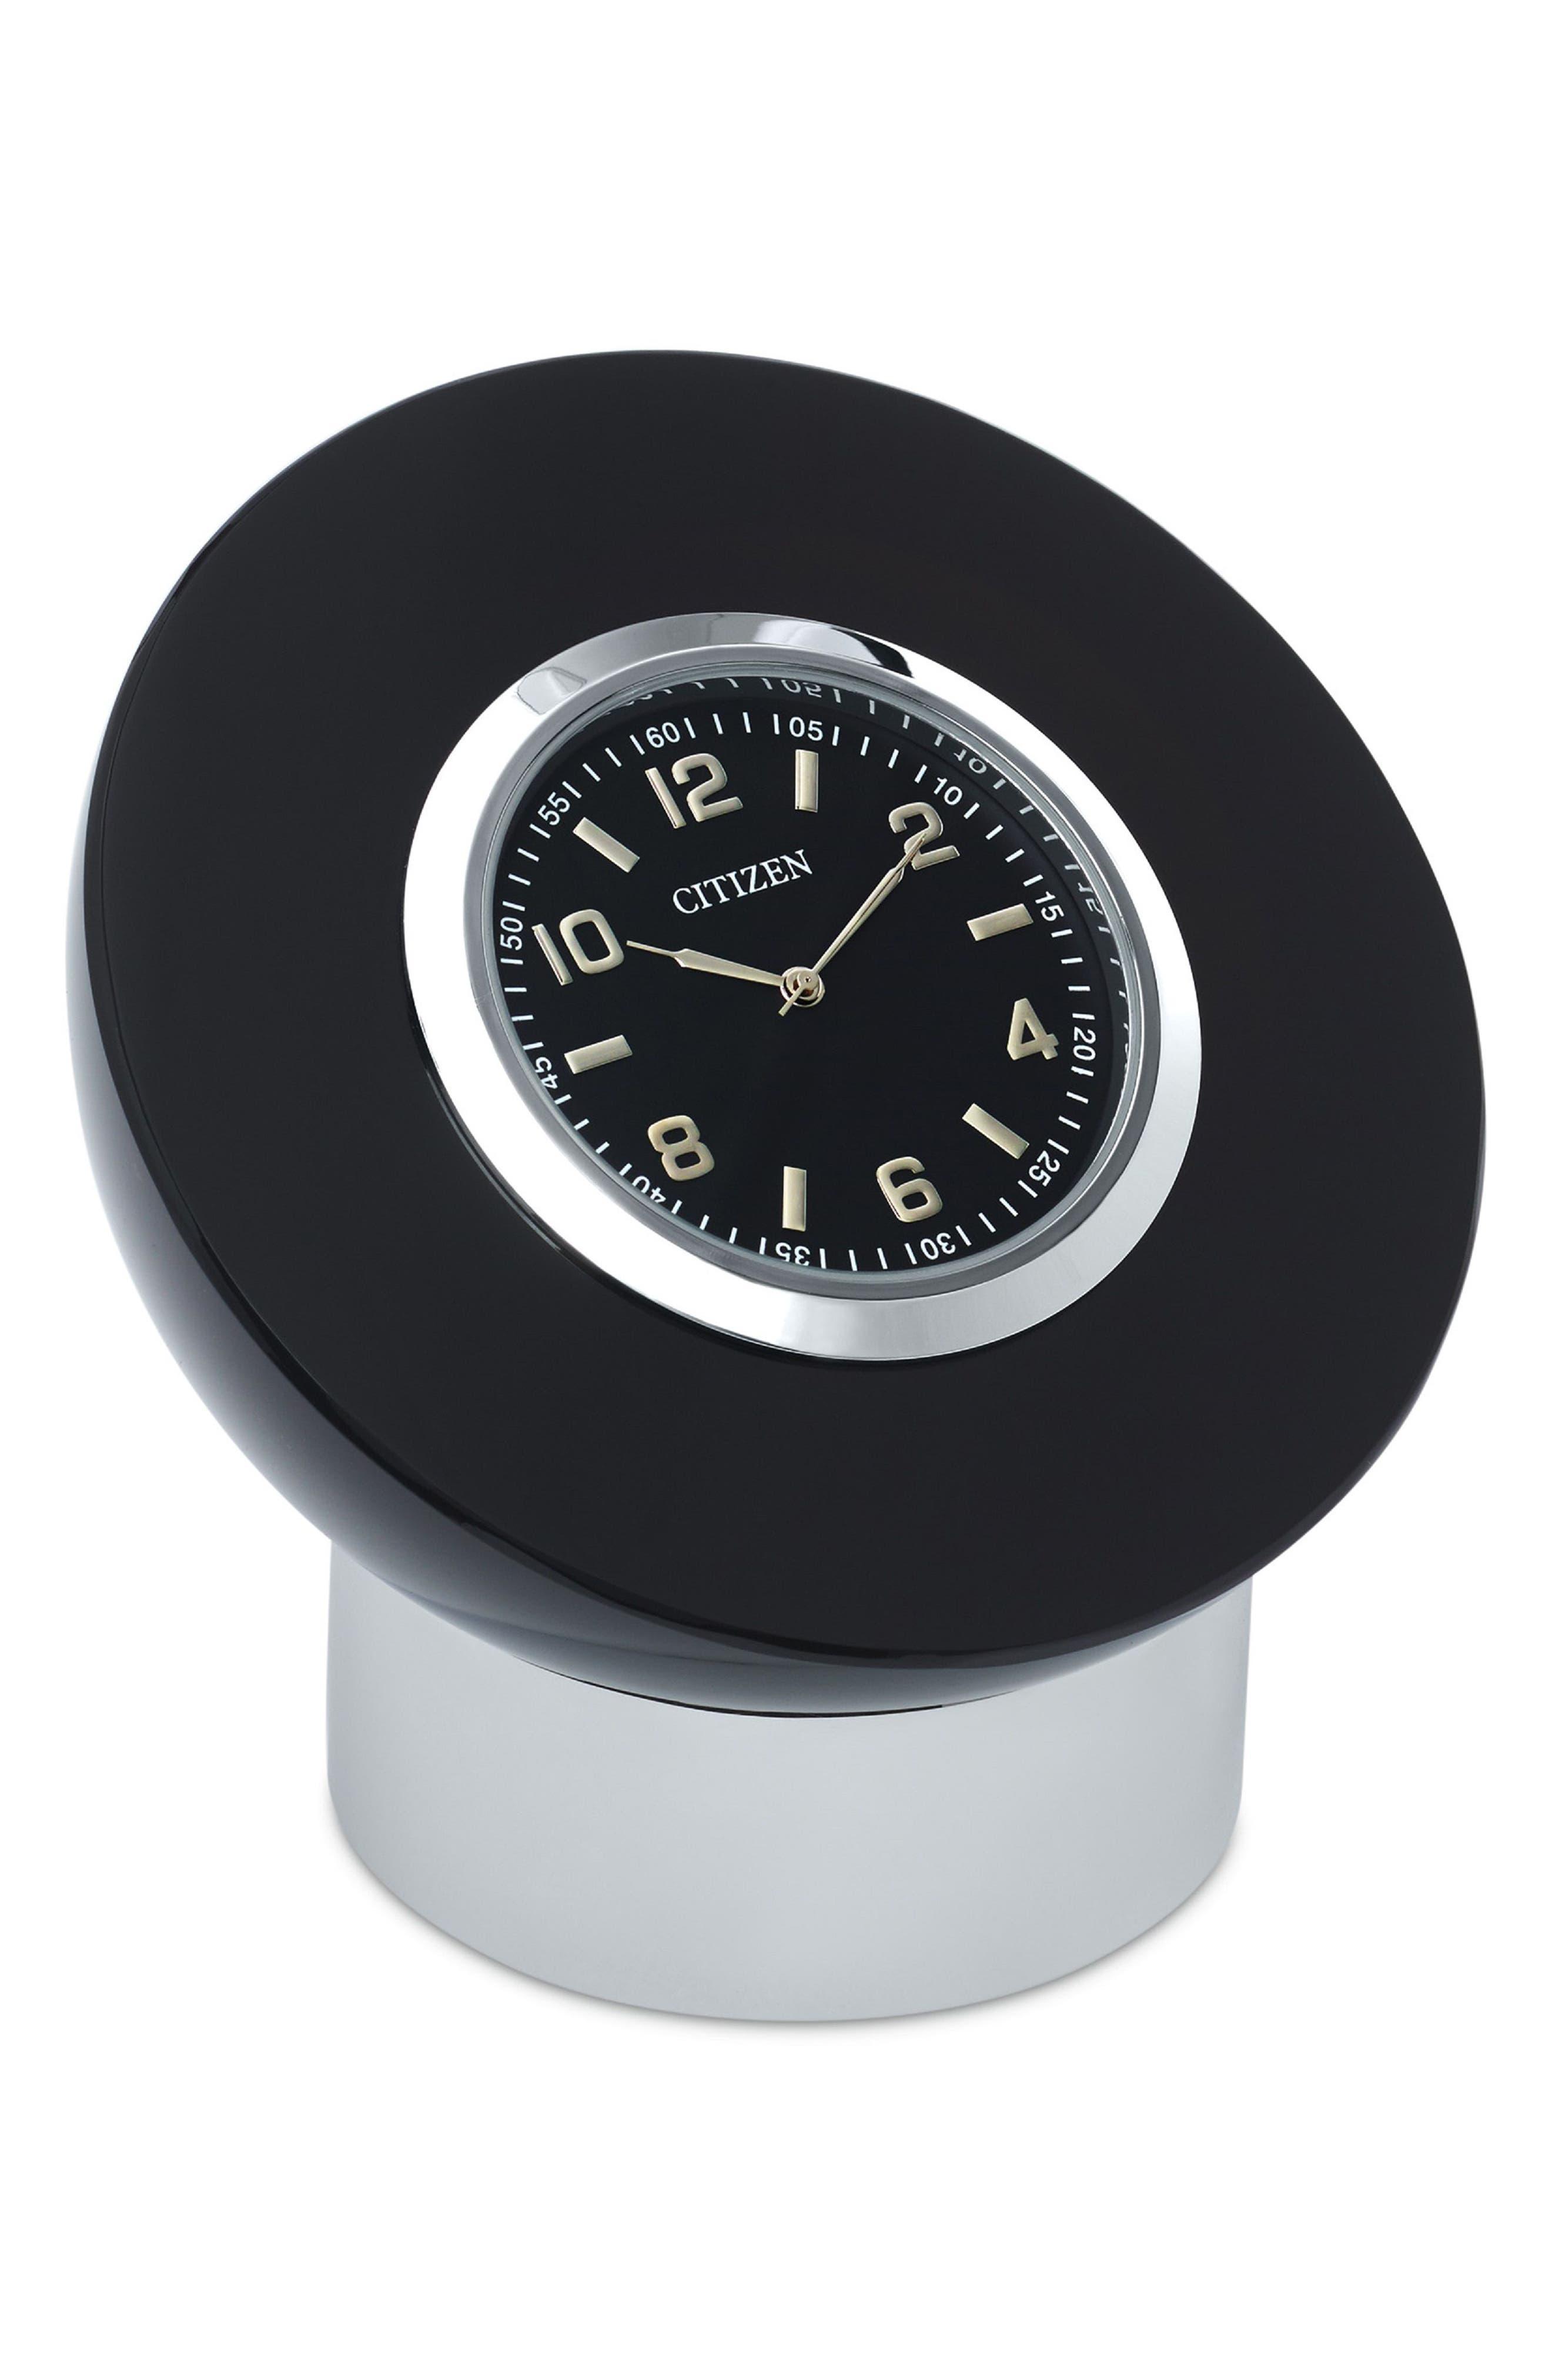 Decorative Accent Desk Clock,                         Main,                         color, Black